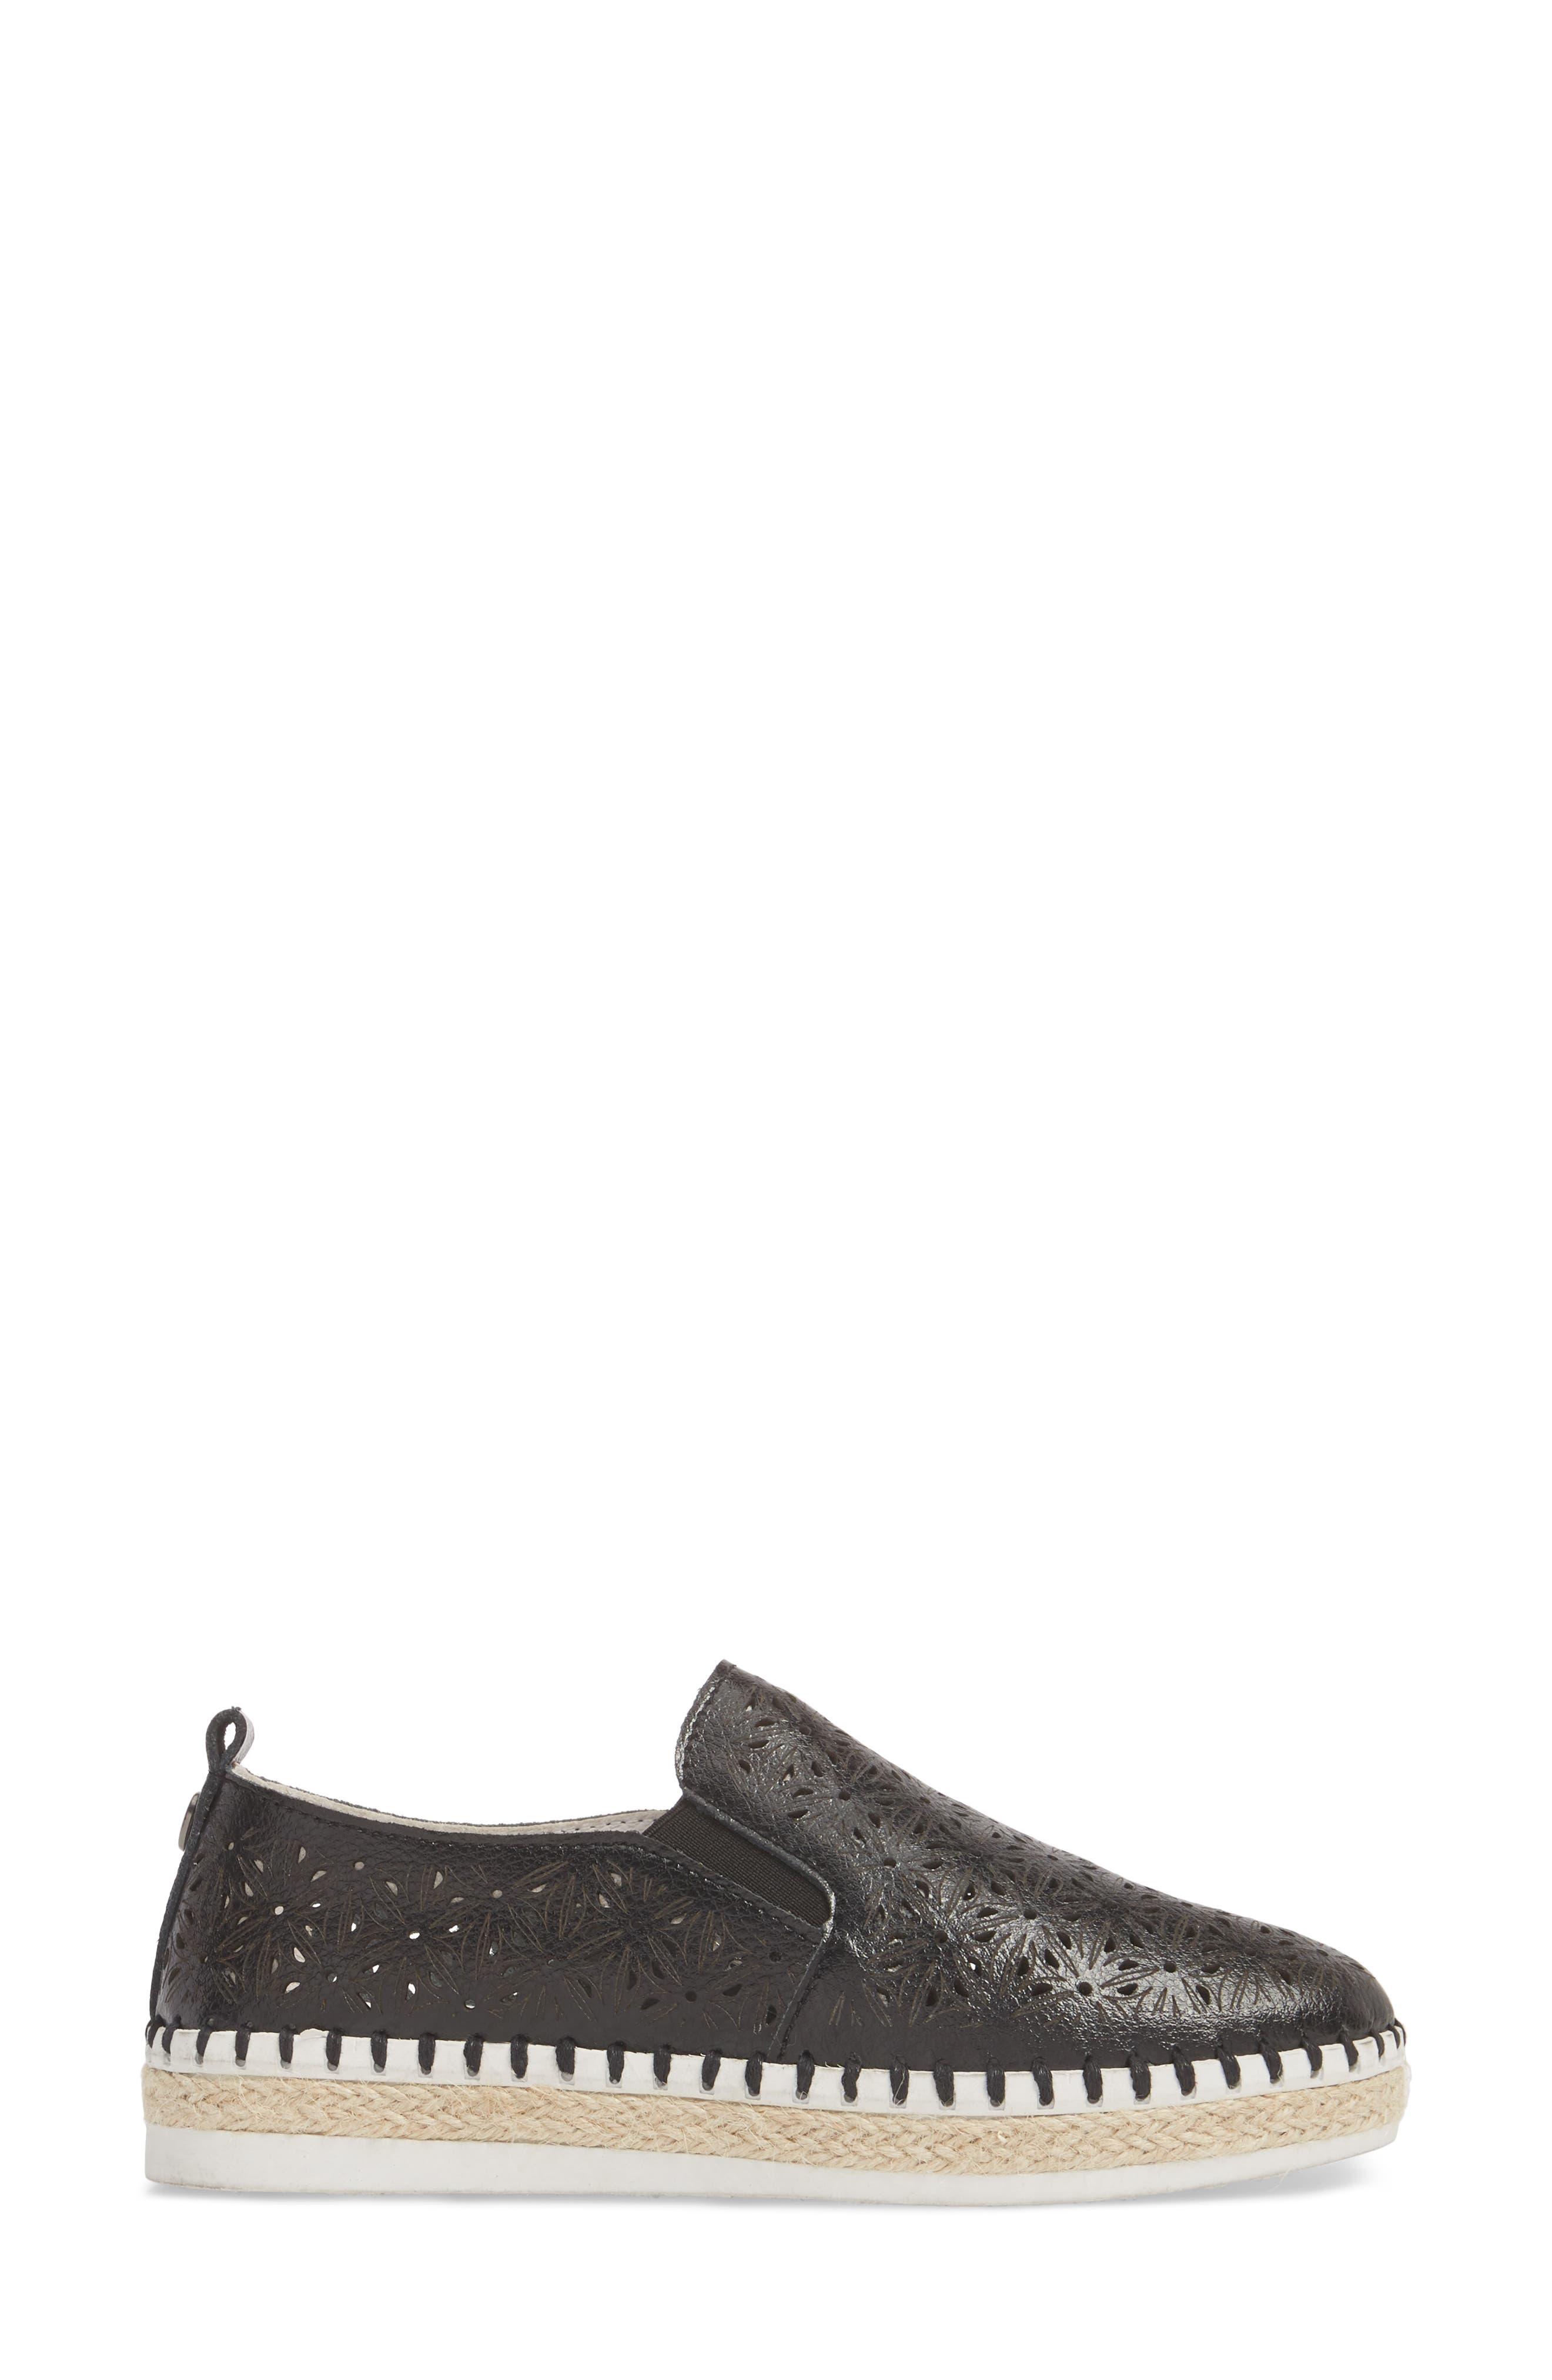 TW101 Espadrille Flat,                             Alternate thumbnail 3, color,                             Black Leather